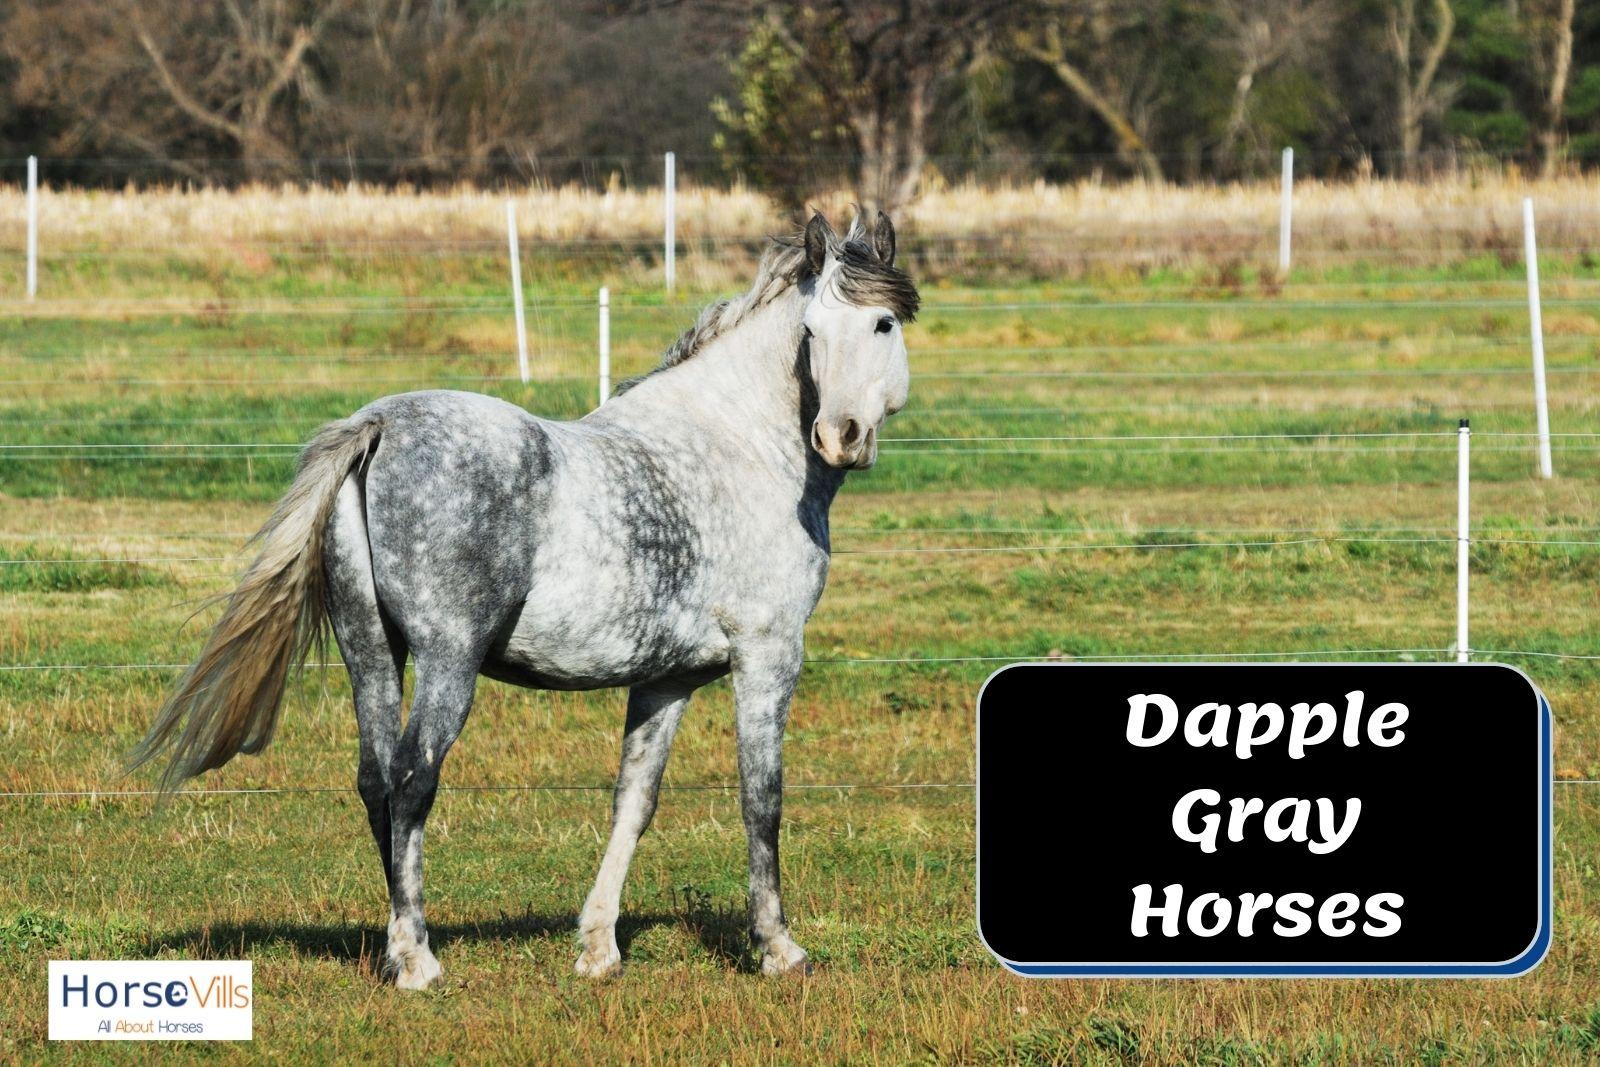 dapple gray horses looking at the back